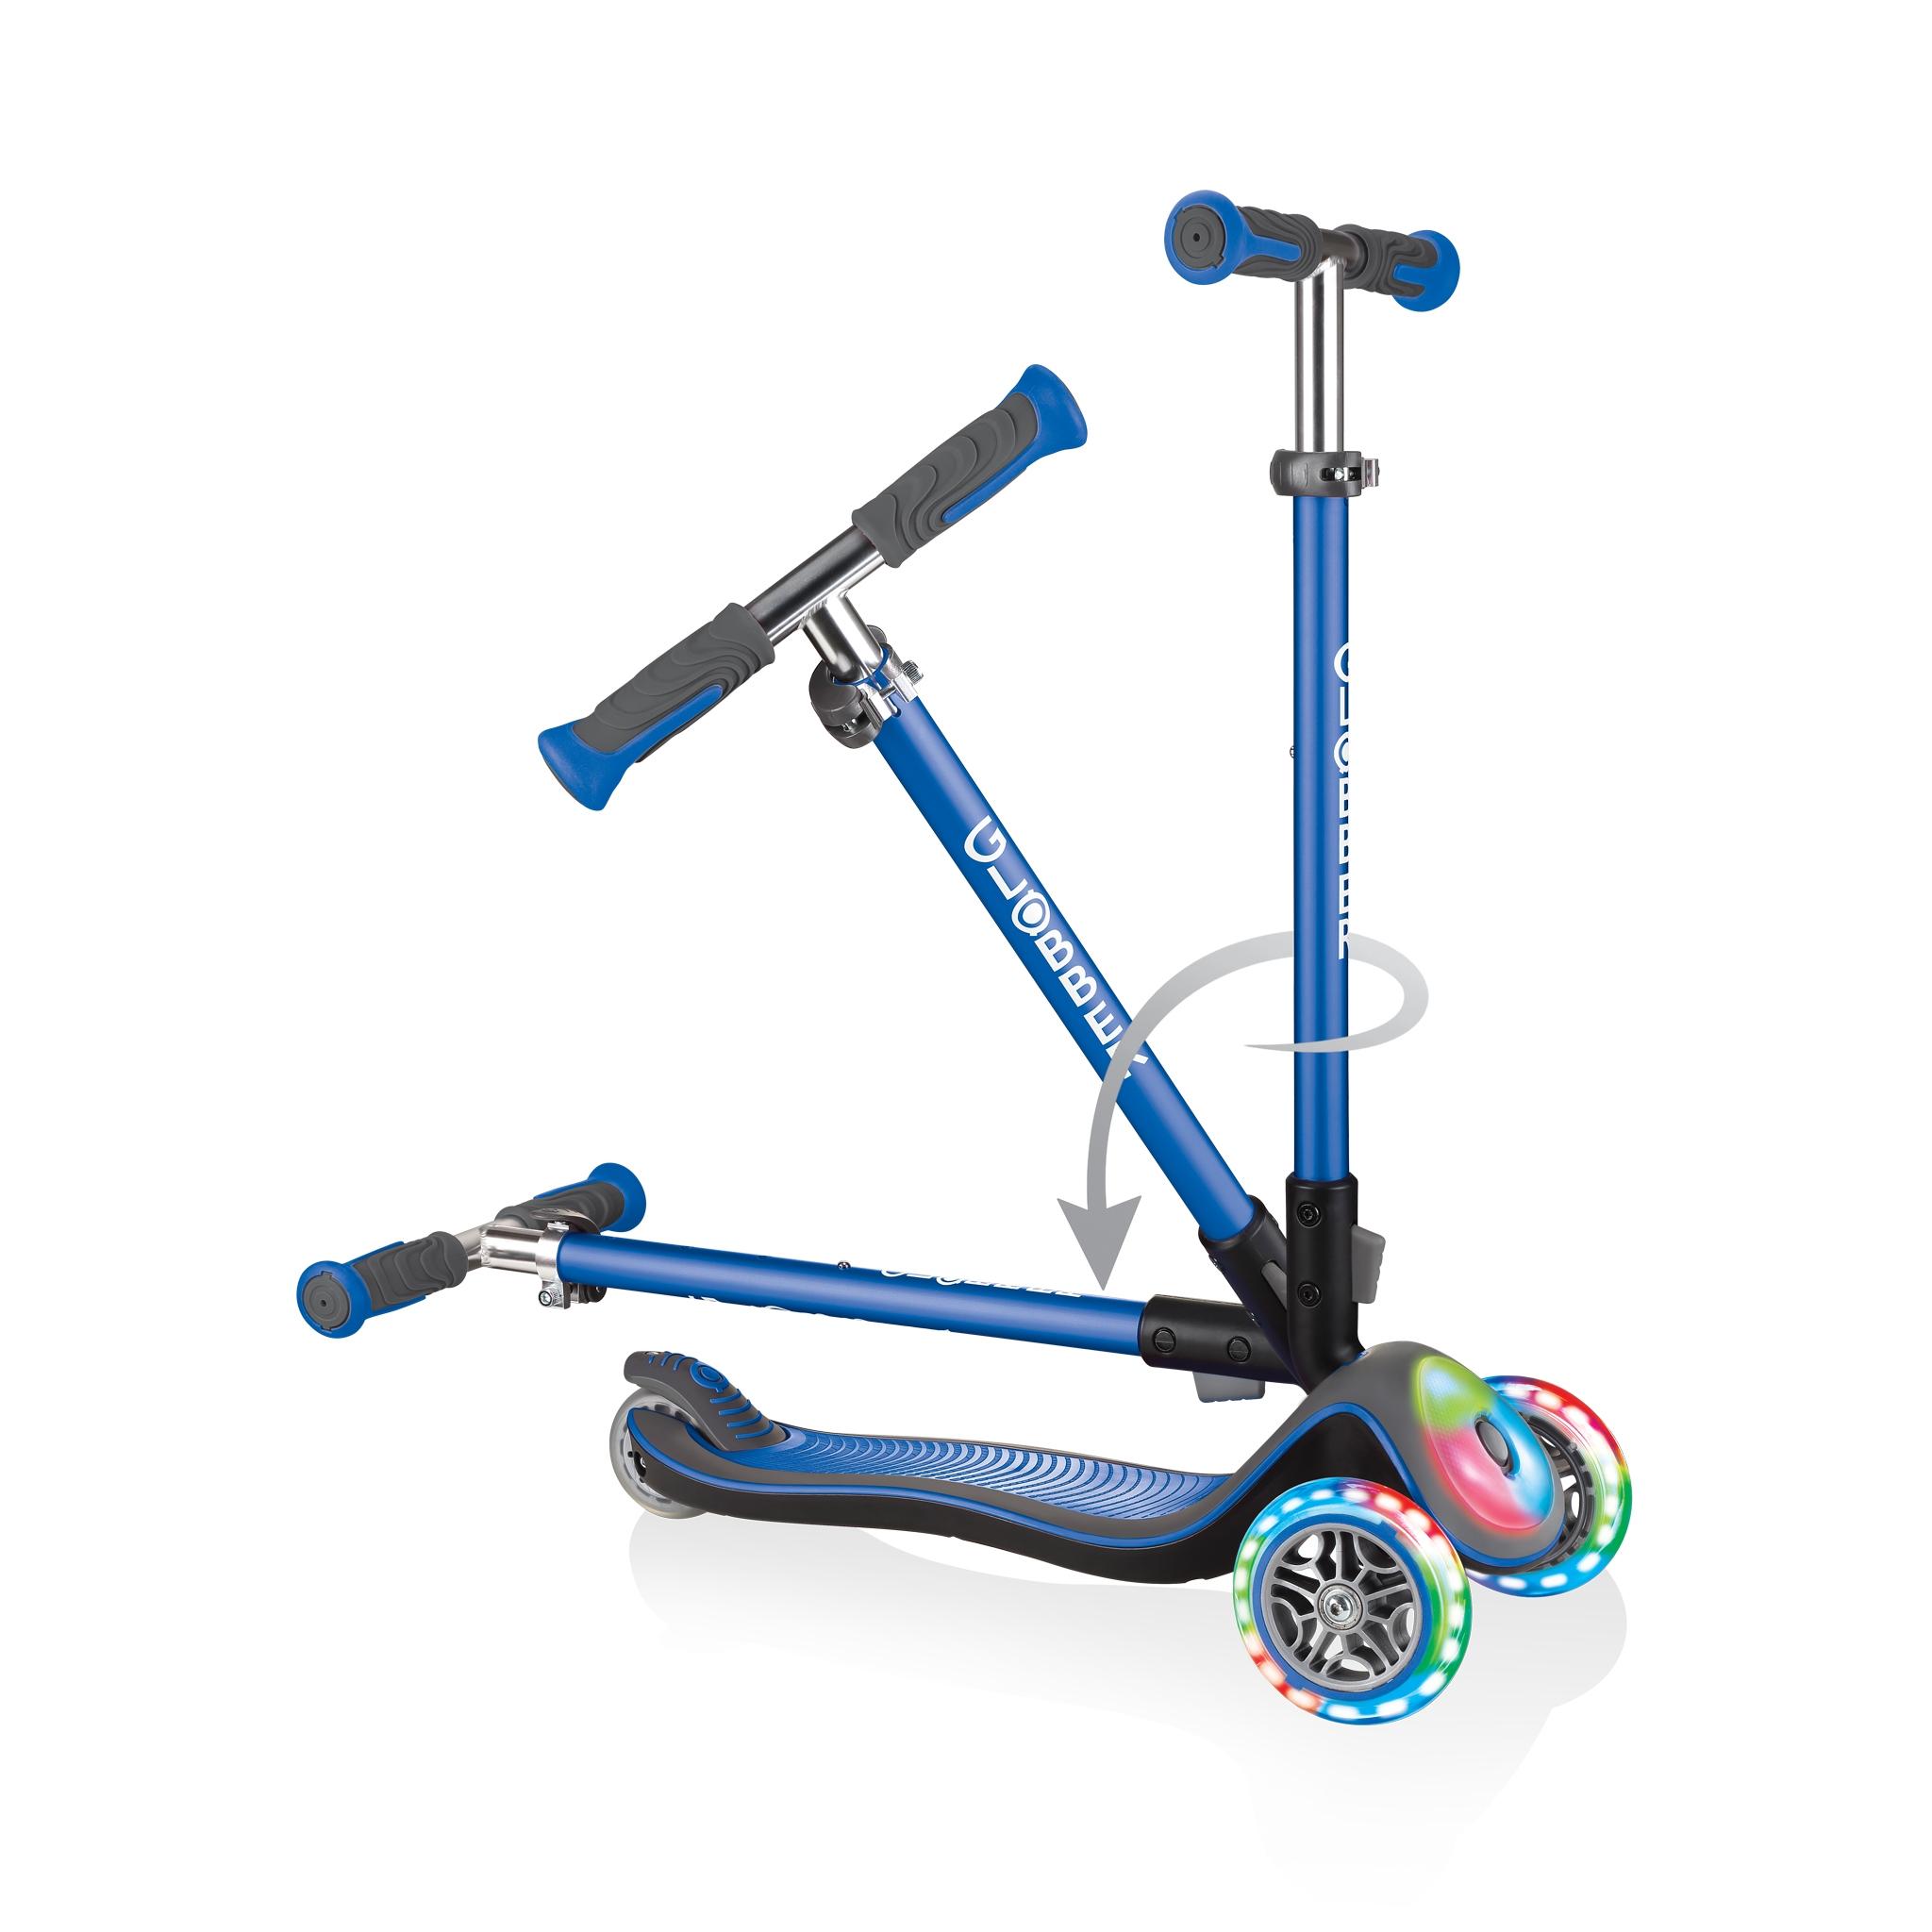 Globber-ELITE-DELUXE-FLASH-LIGHTS-3-wheel-light-up-scooter-for-kids-fold-up-scooter-navy-blue 1